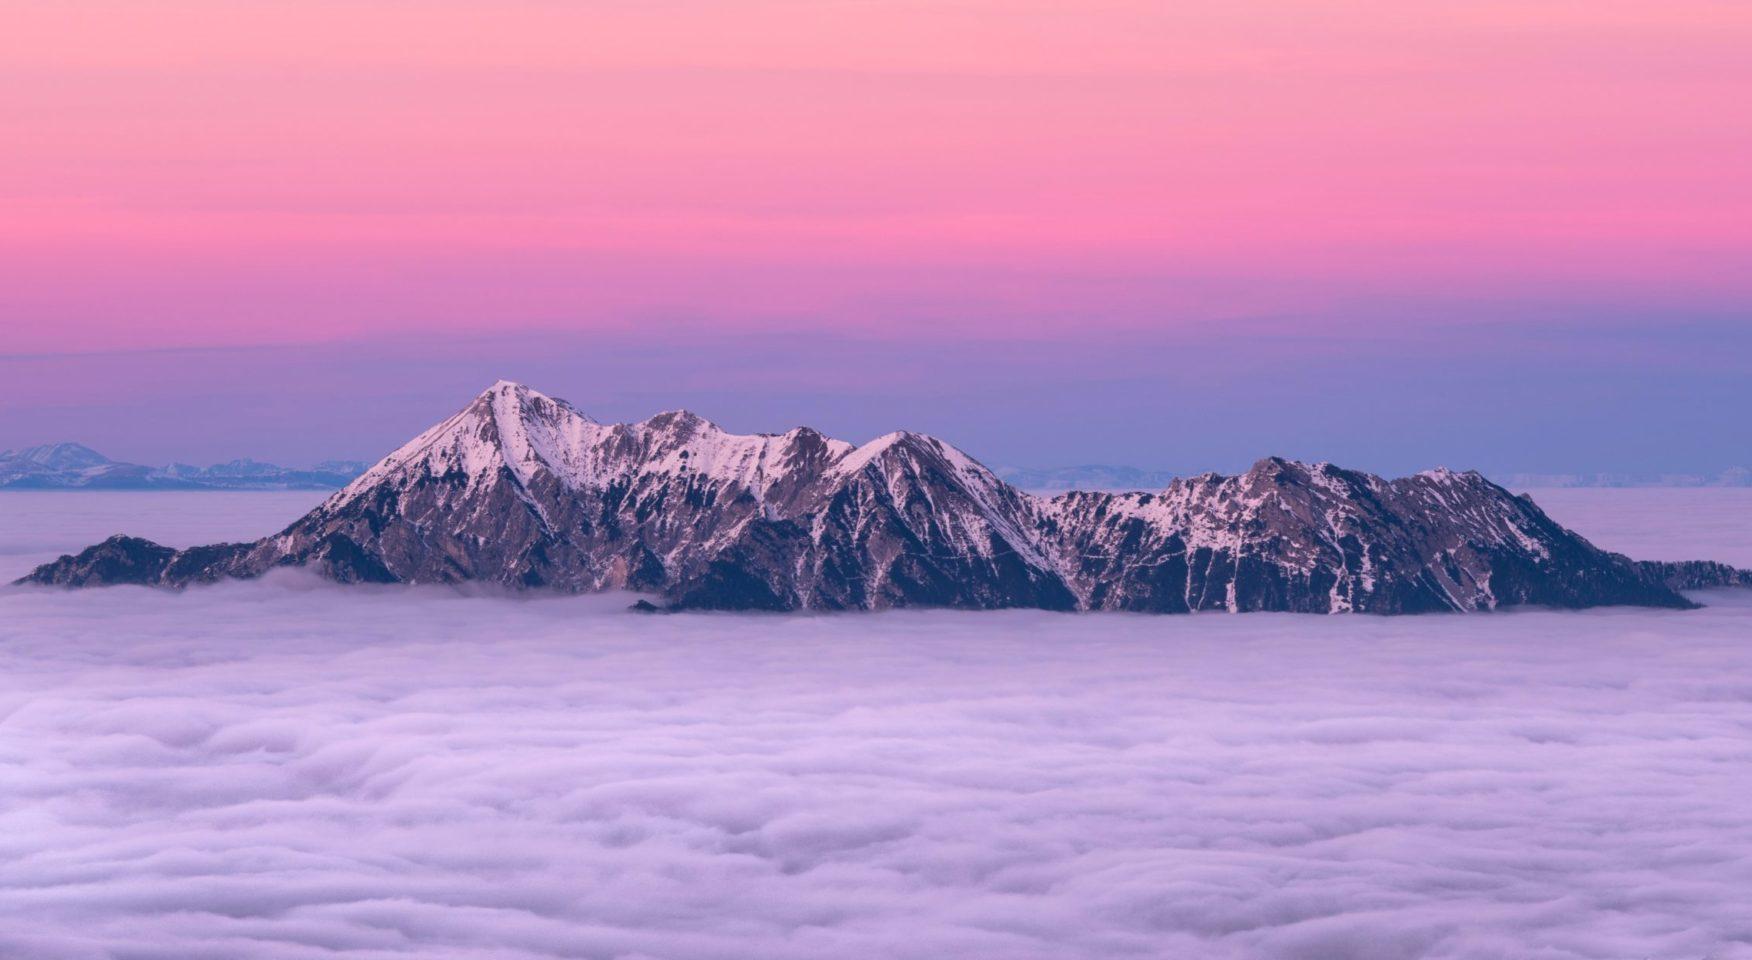 Rocky mountain tops peeking through clouds against briight purple pink sky